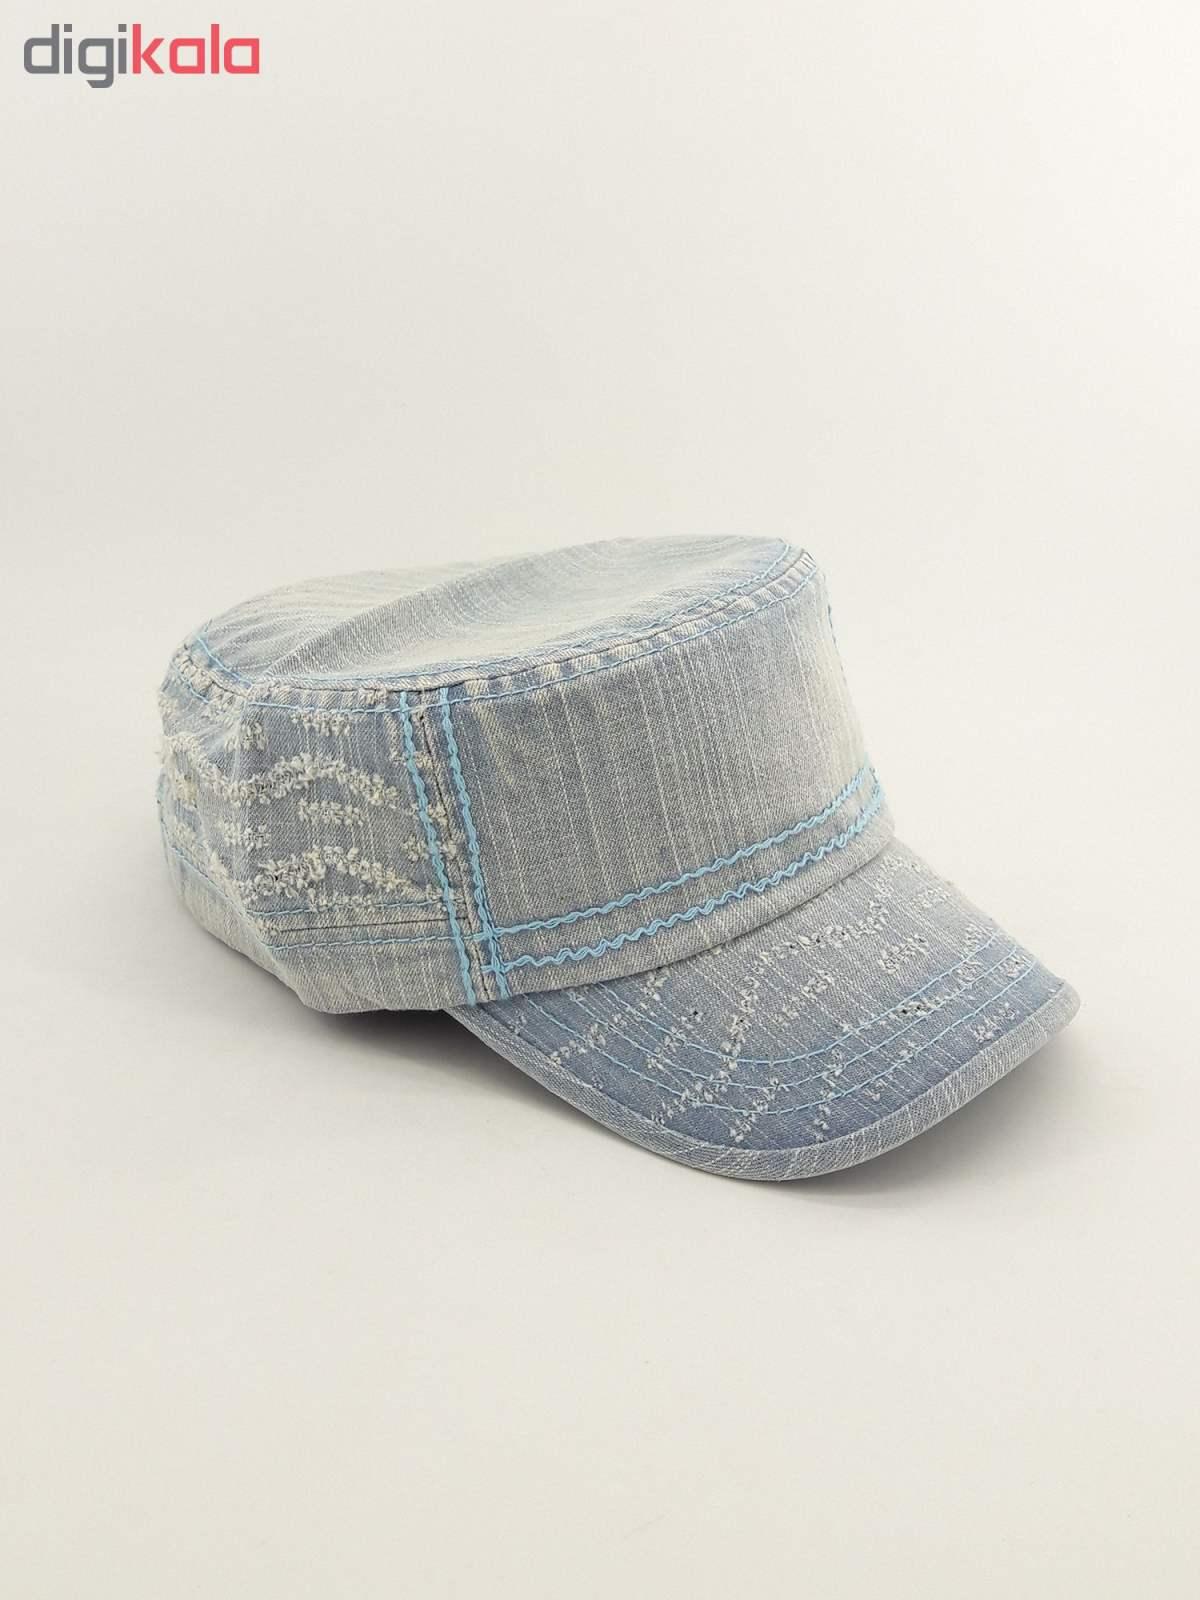 کلاه کپ مردانه مدل Lee.blu-01 main 1 1